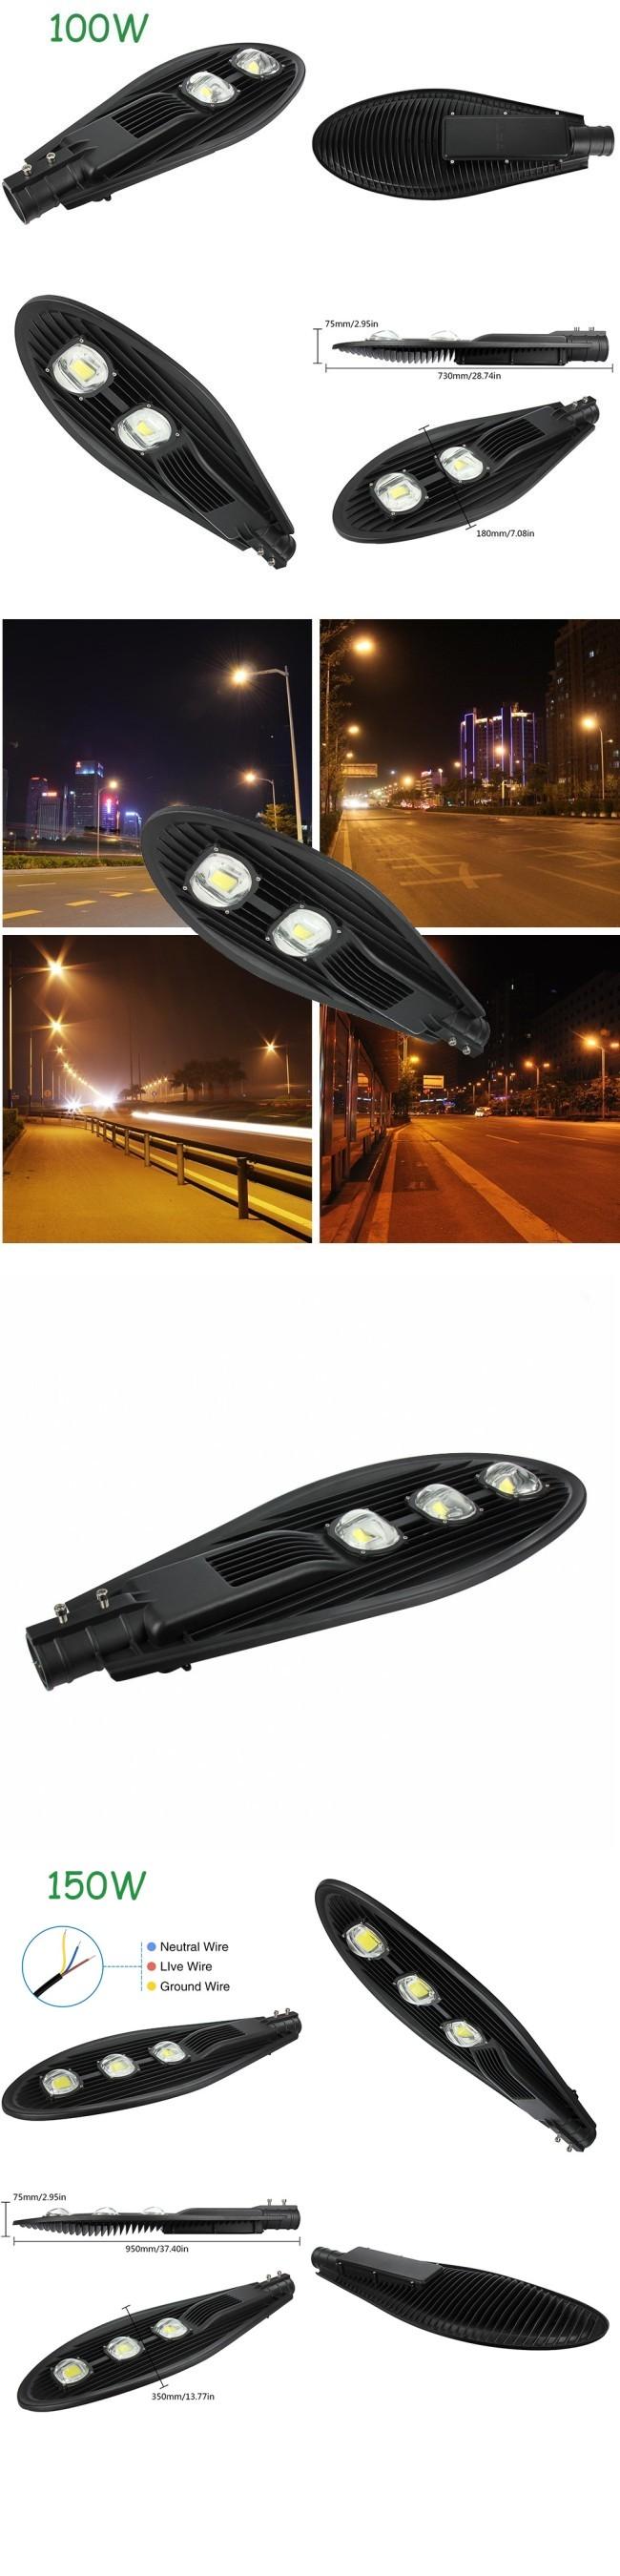 AC DC 24V 12V 50W LED Energy Saving Outdoor Solar Street Light